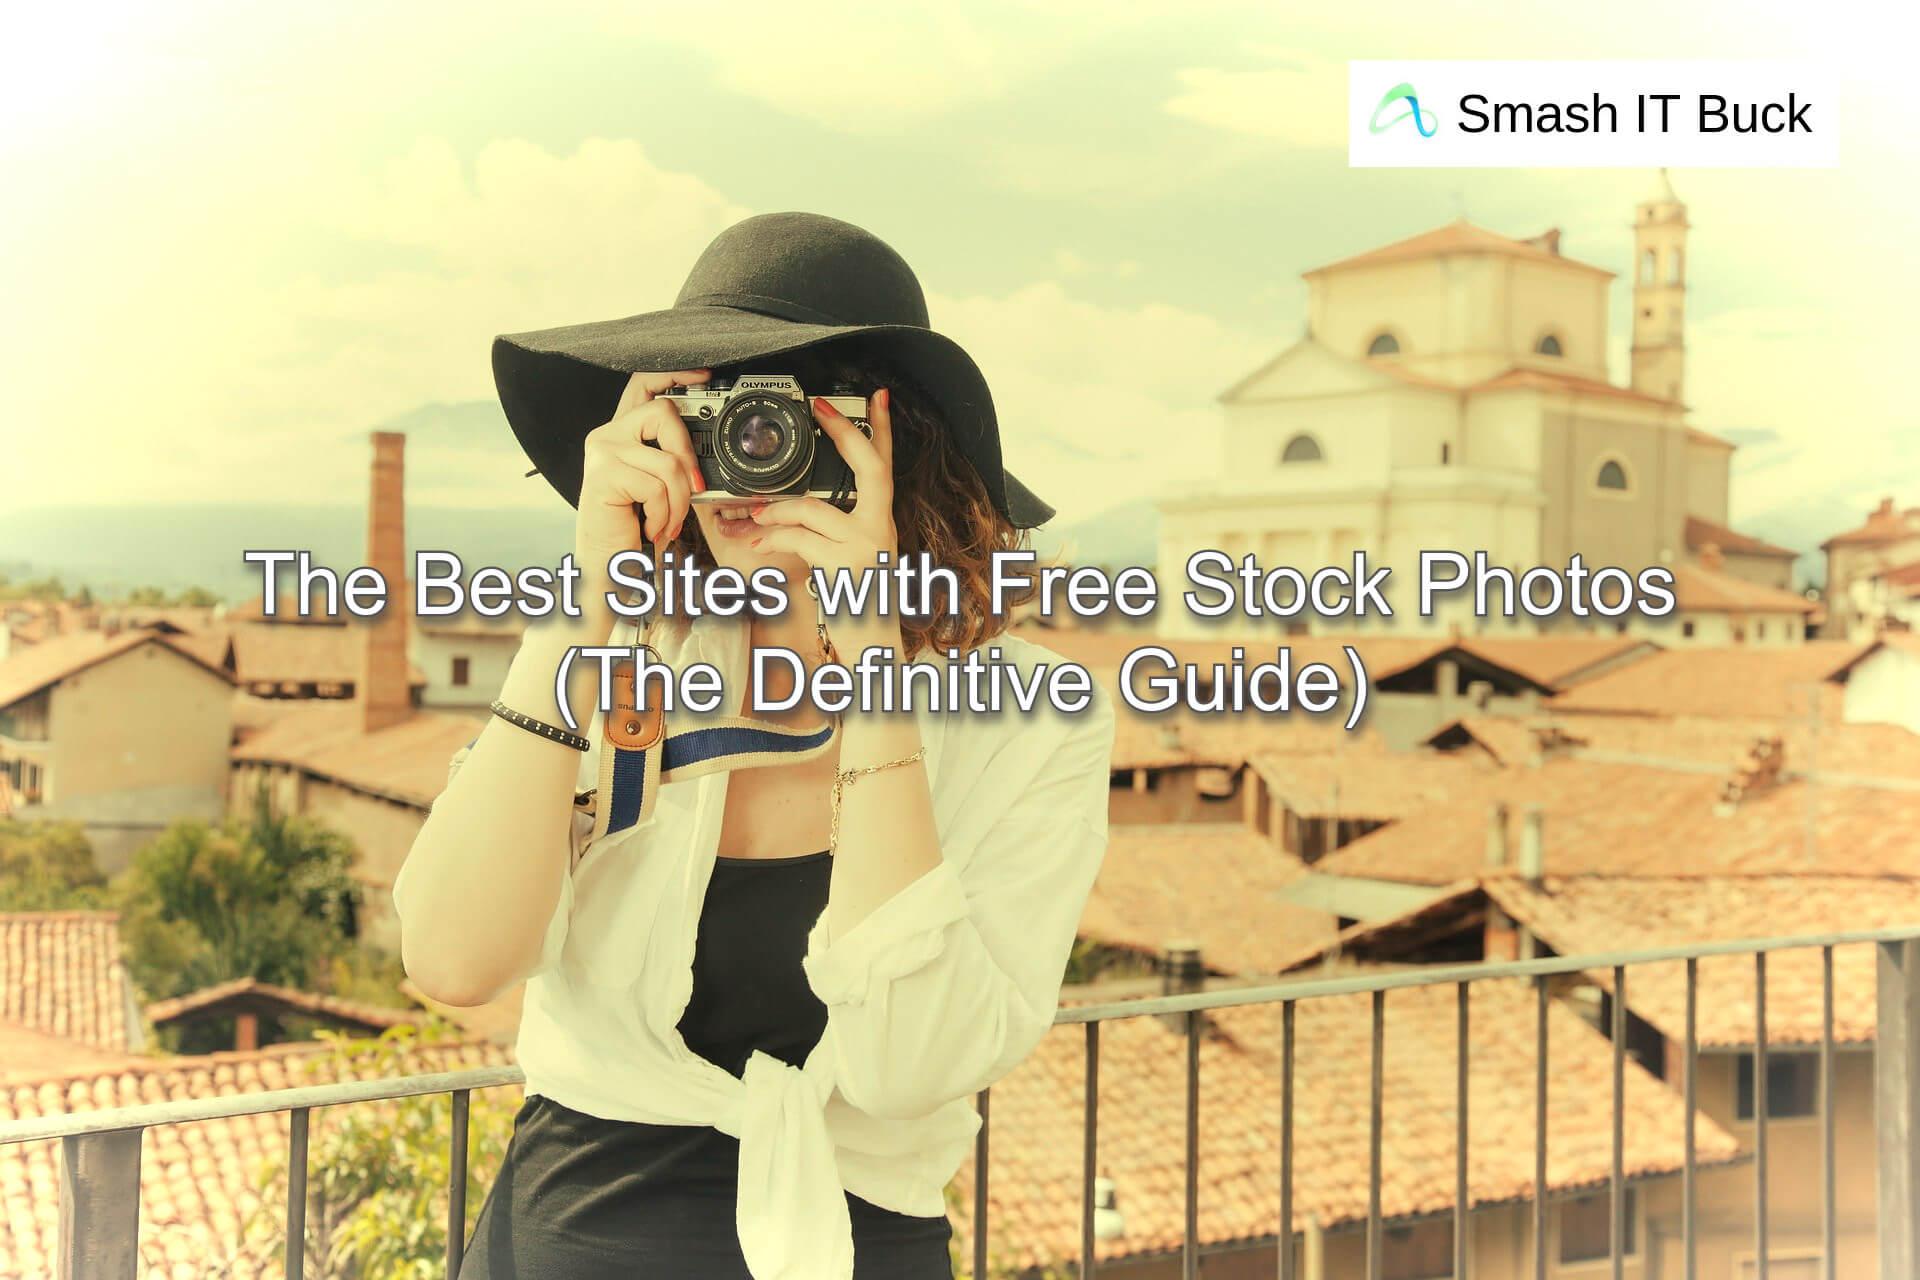 Best Sites providing Free Stock Photos in 2021